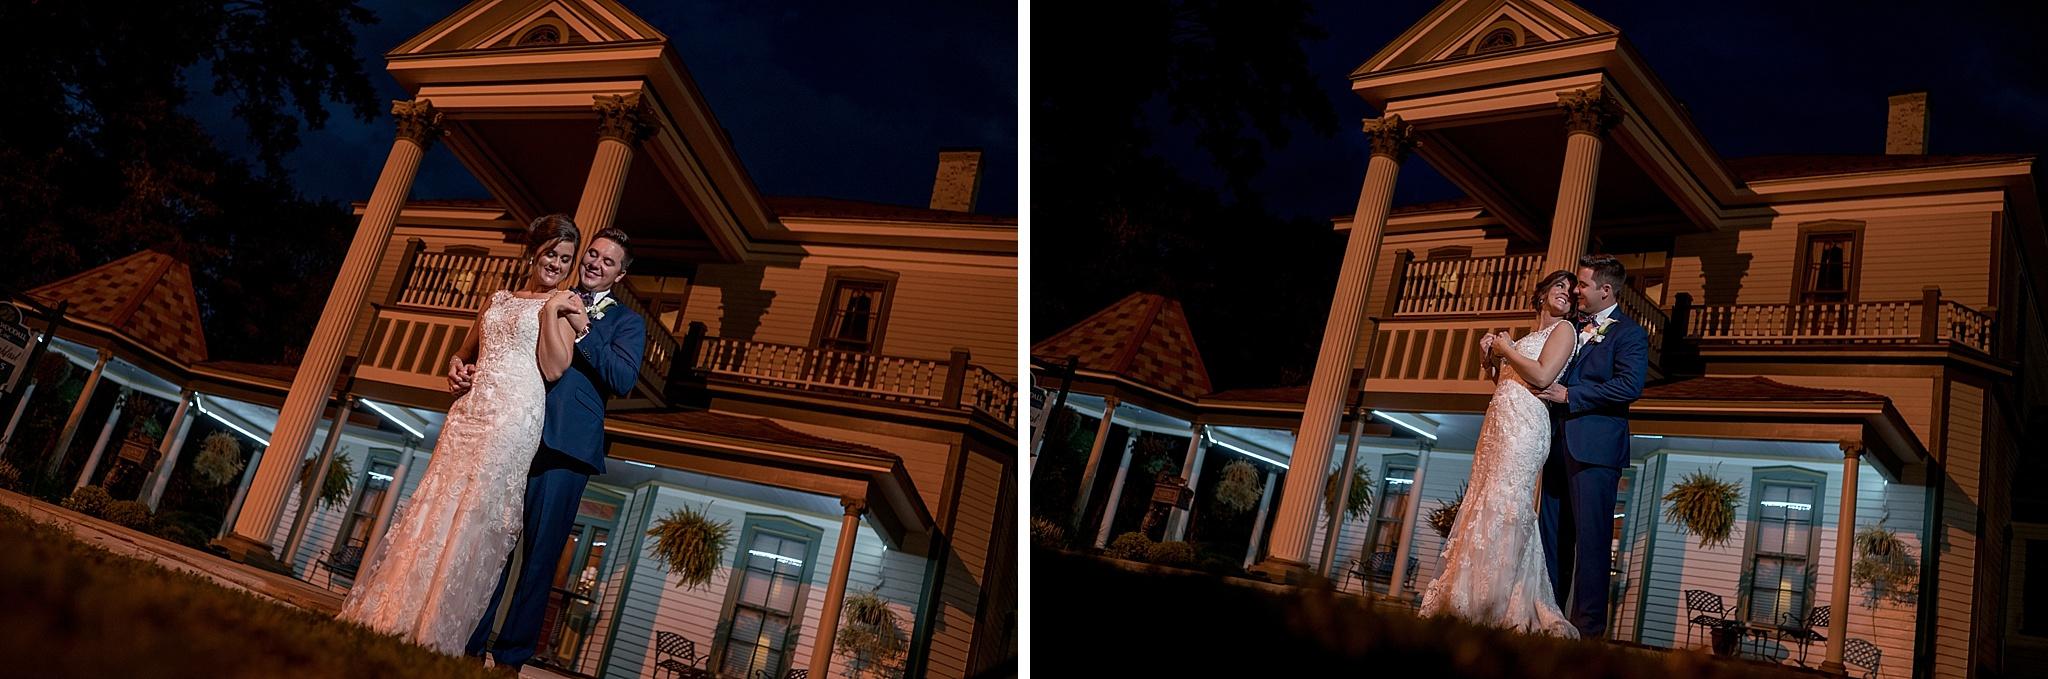 Preston-Woodall-House-Benson-NC-Photographer-056.jpg